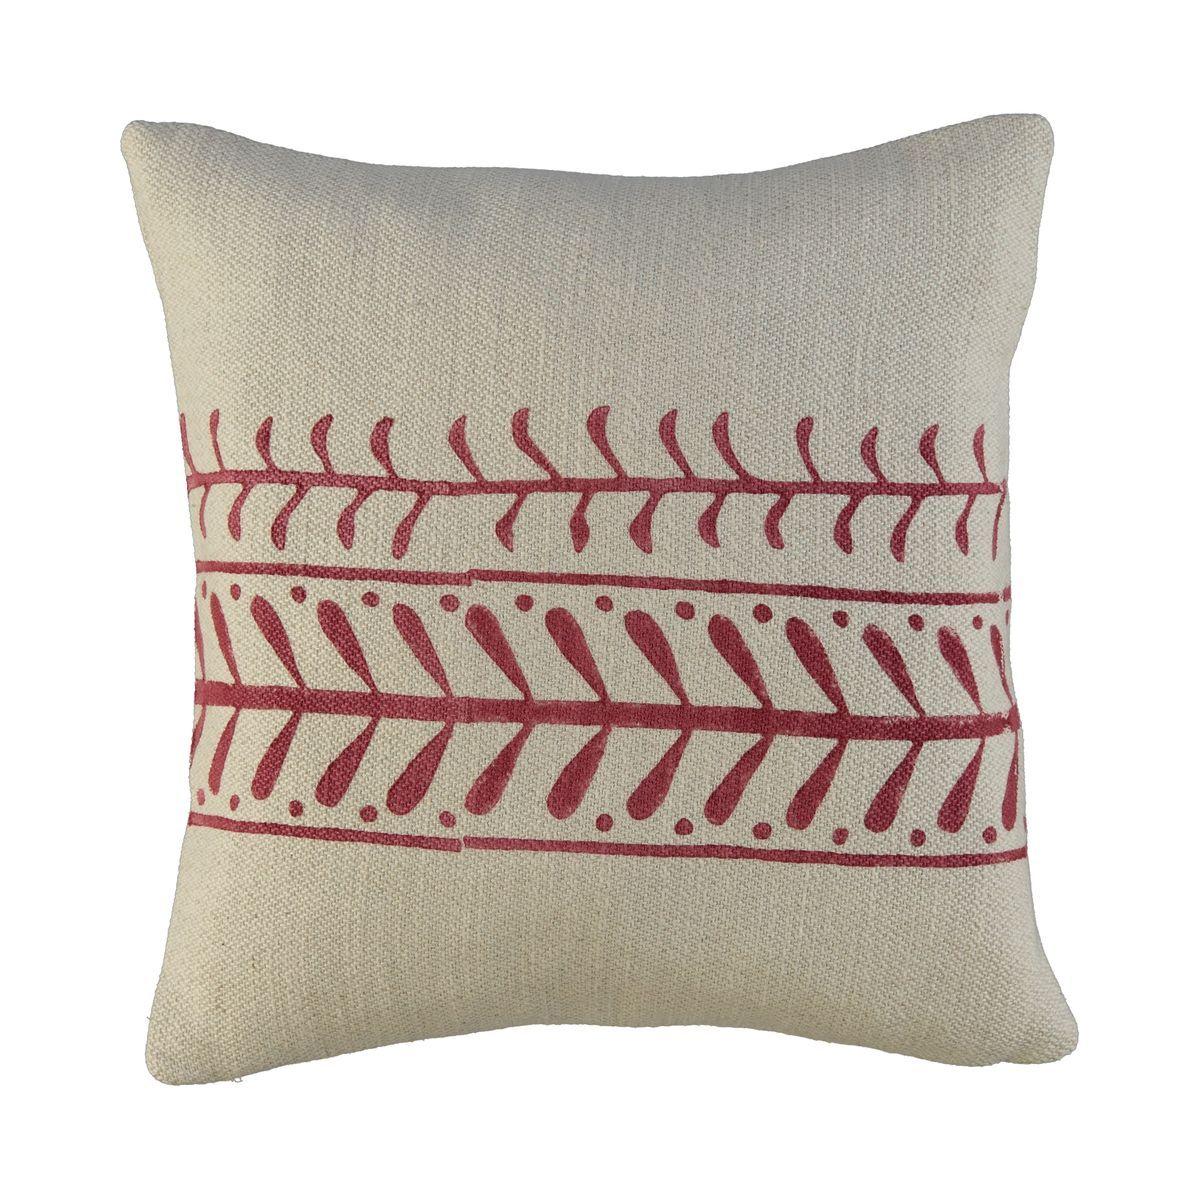 Cushion Cover / 15 Hand Printed - Bordeaux